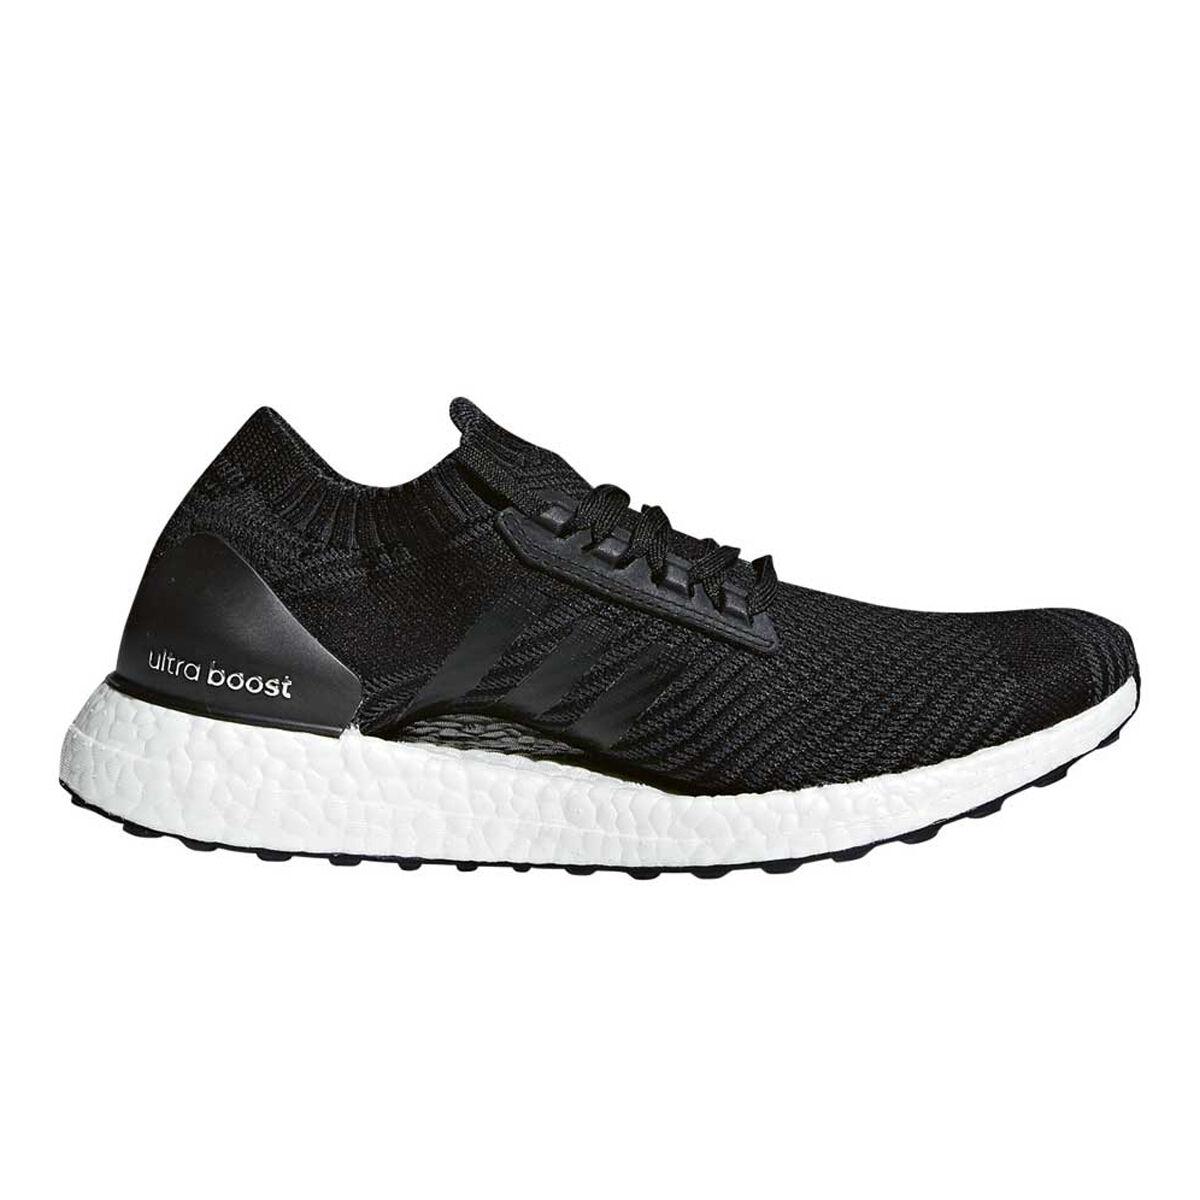 8cfed9a43 ... clearance adidas ultraboost x womens running shoes black us 10 black  rebelhi res e5cd0 d085c